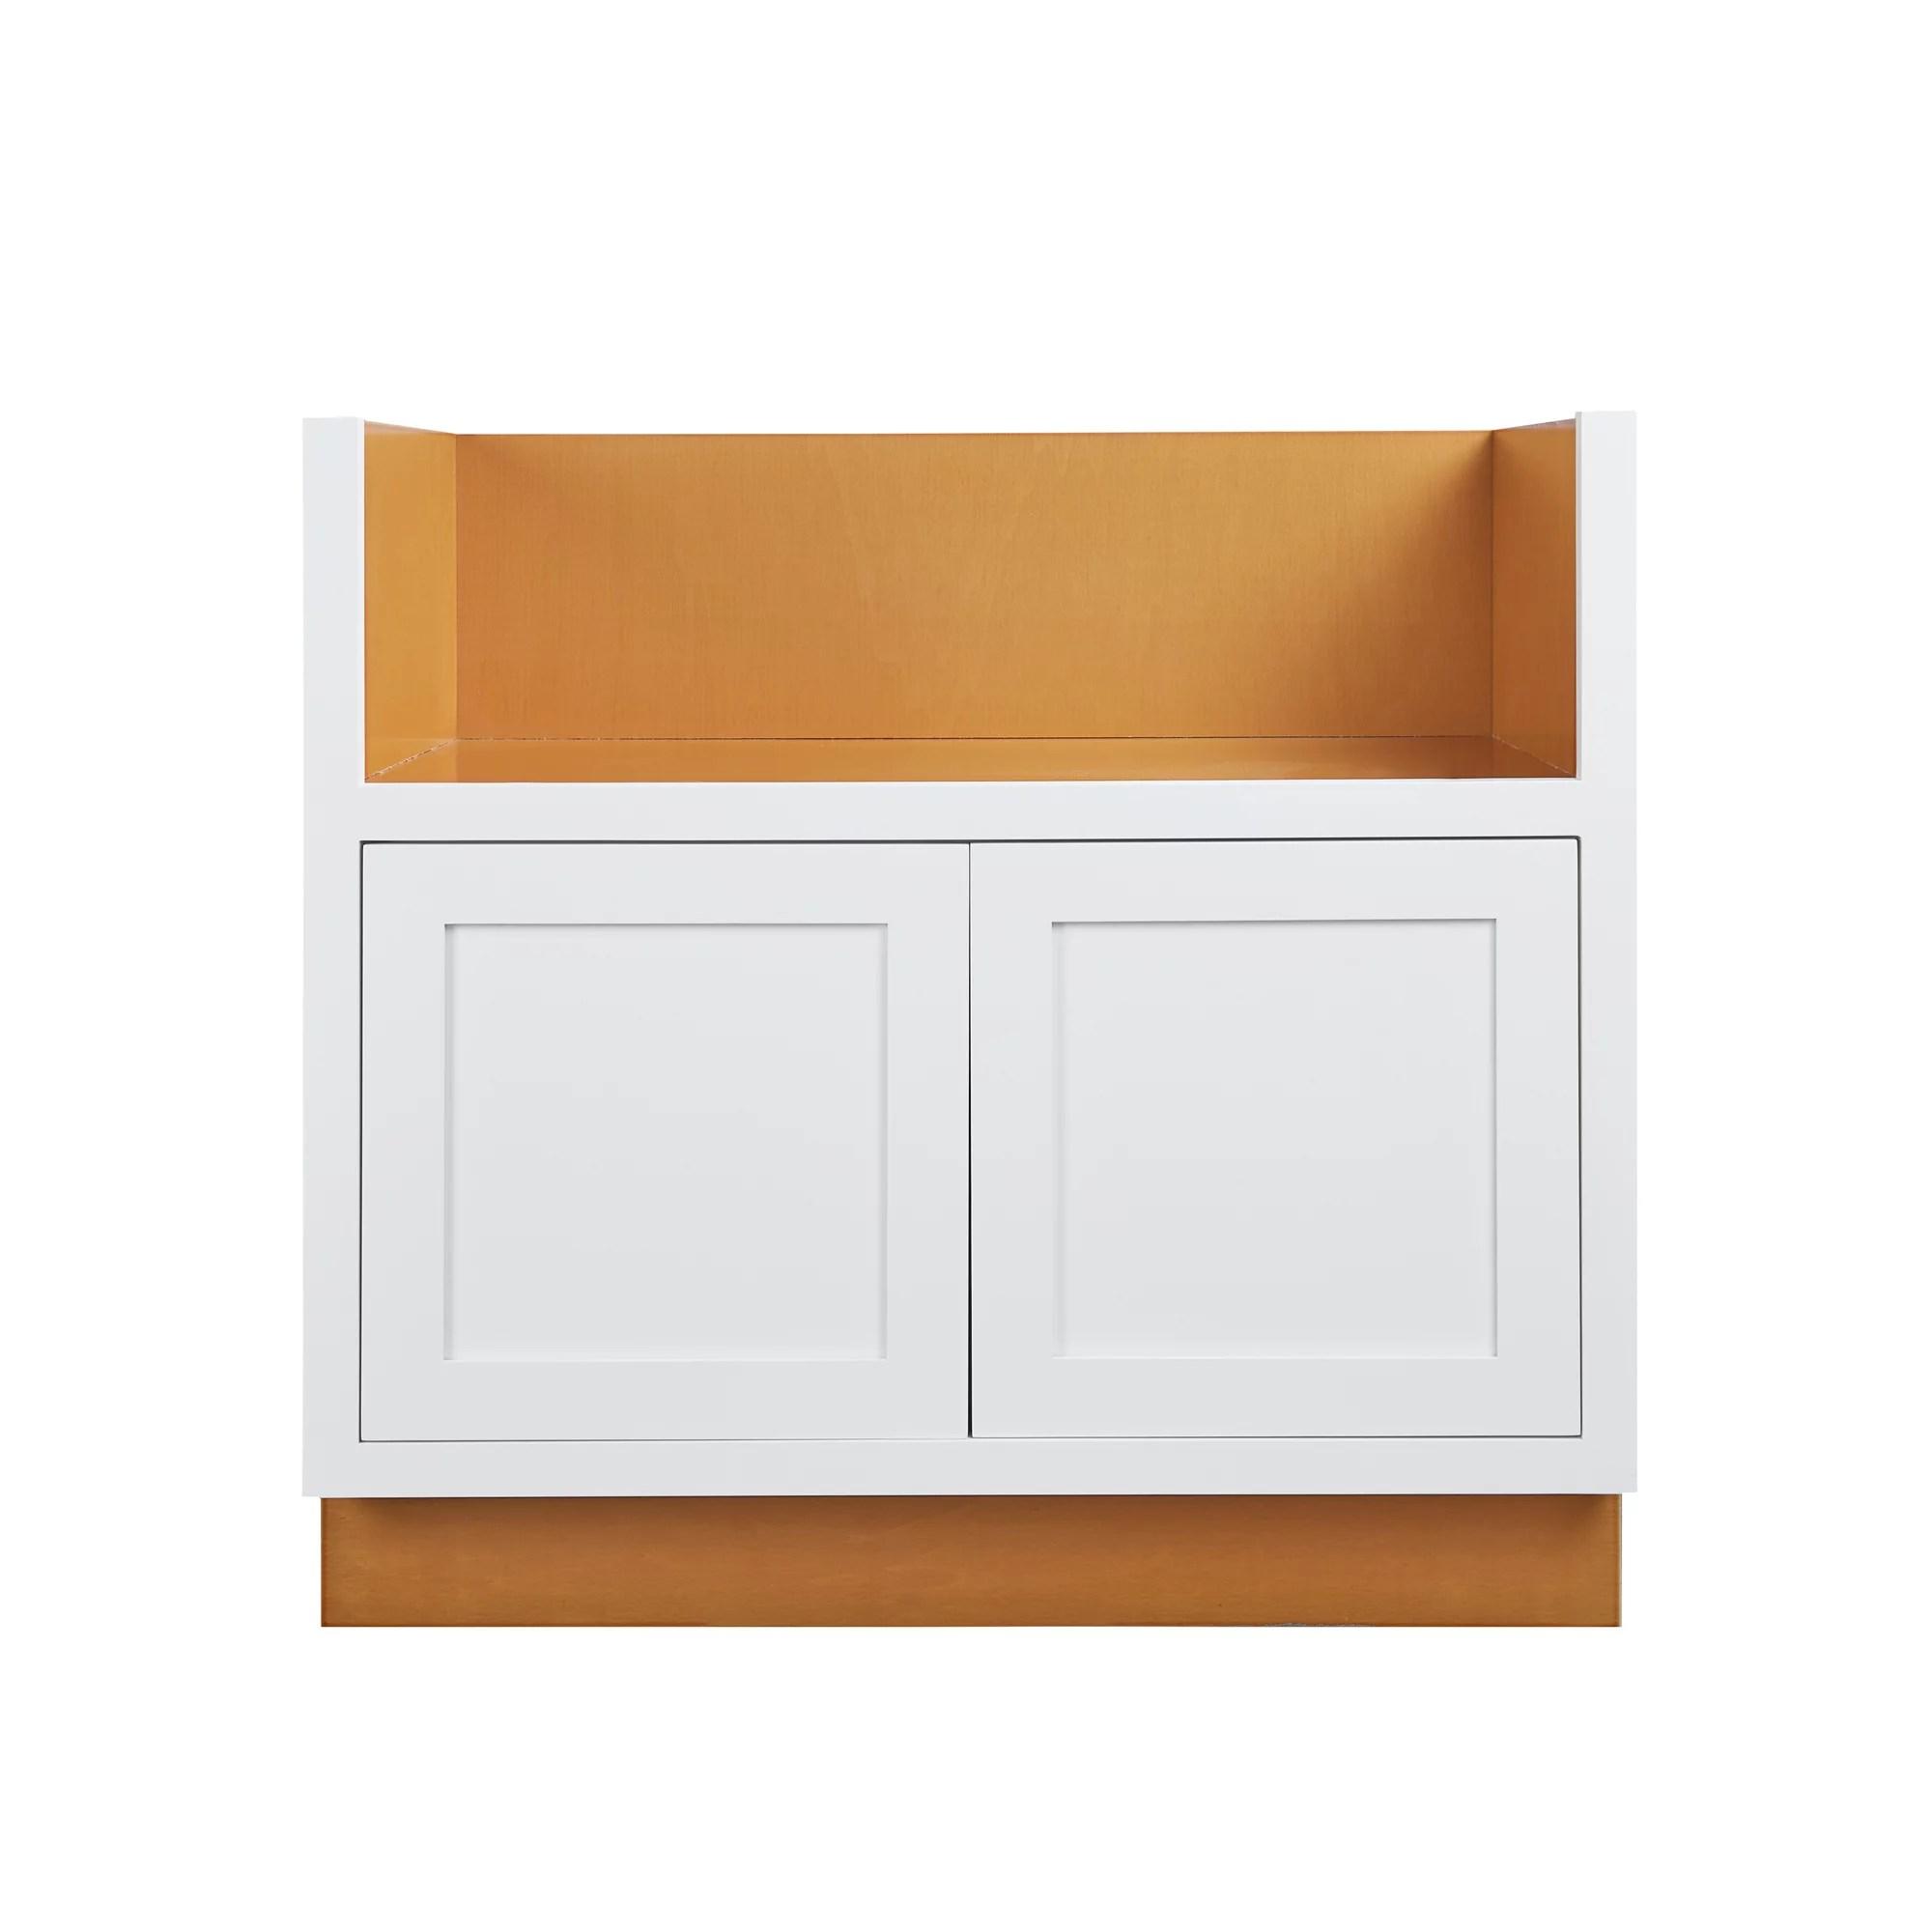 33 wide farm sink base kitchen cabinet snow white inset shaker fits 30 farm sink unassembled walmart com